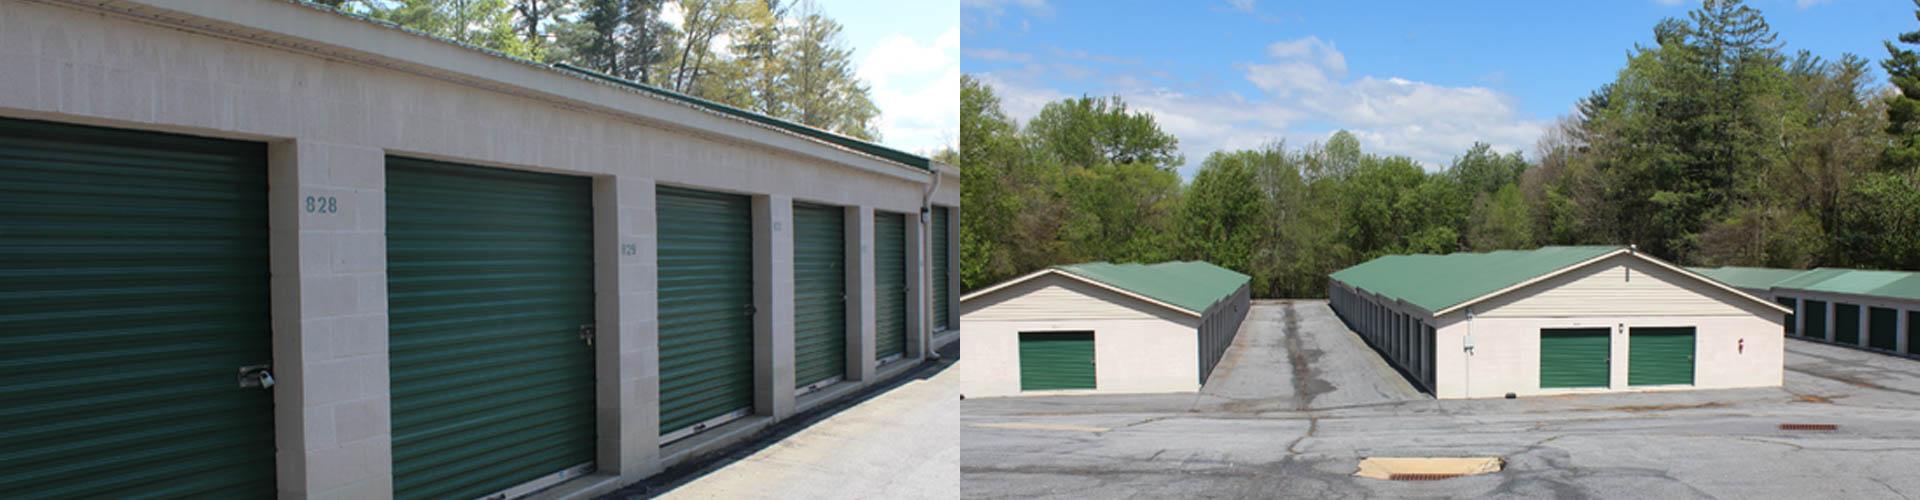 Hendersonville NC Storage